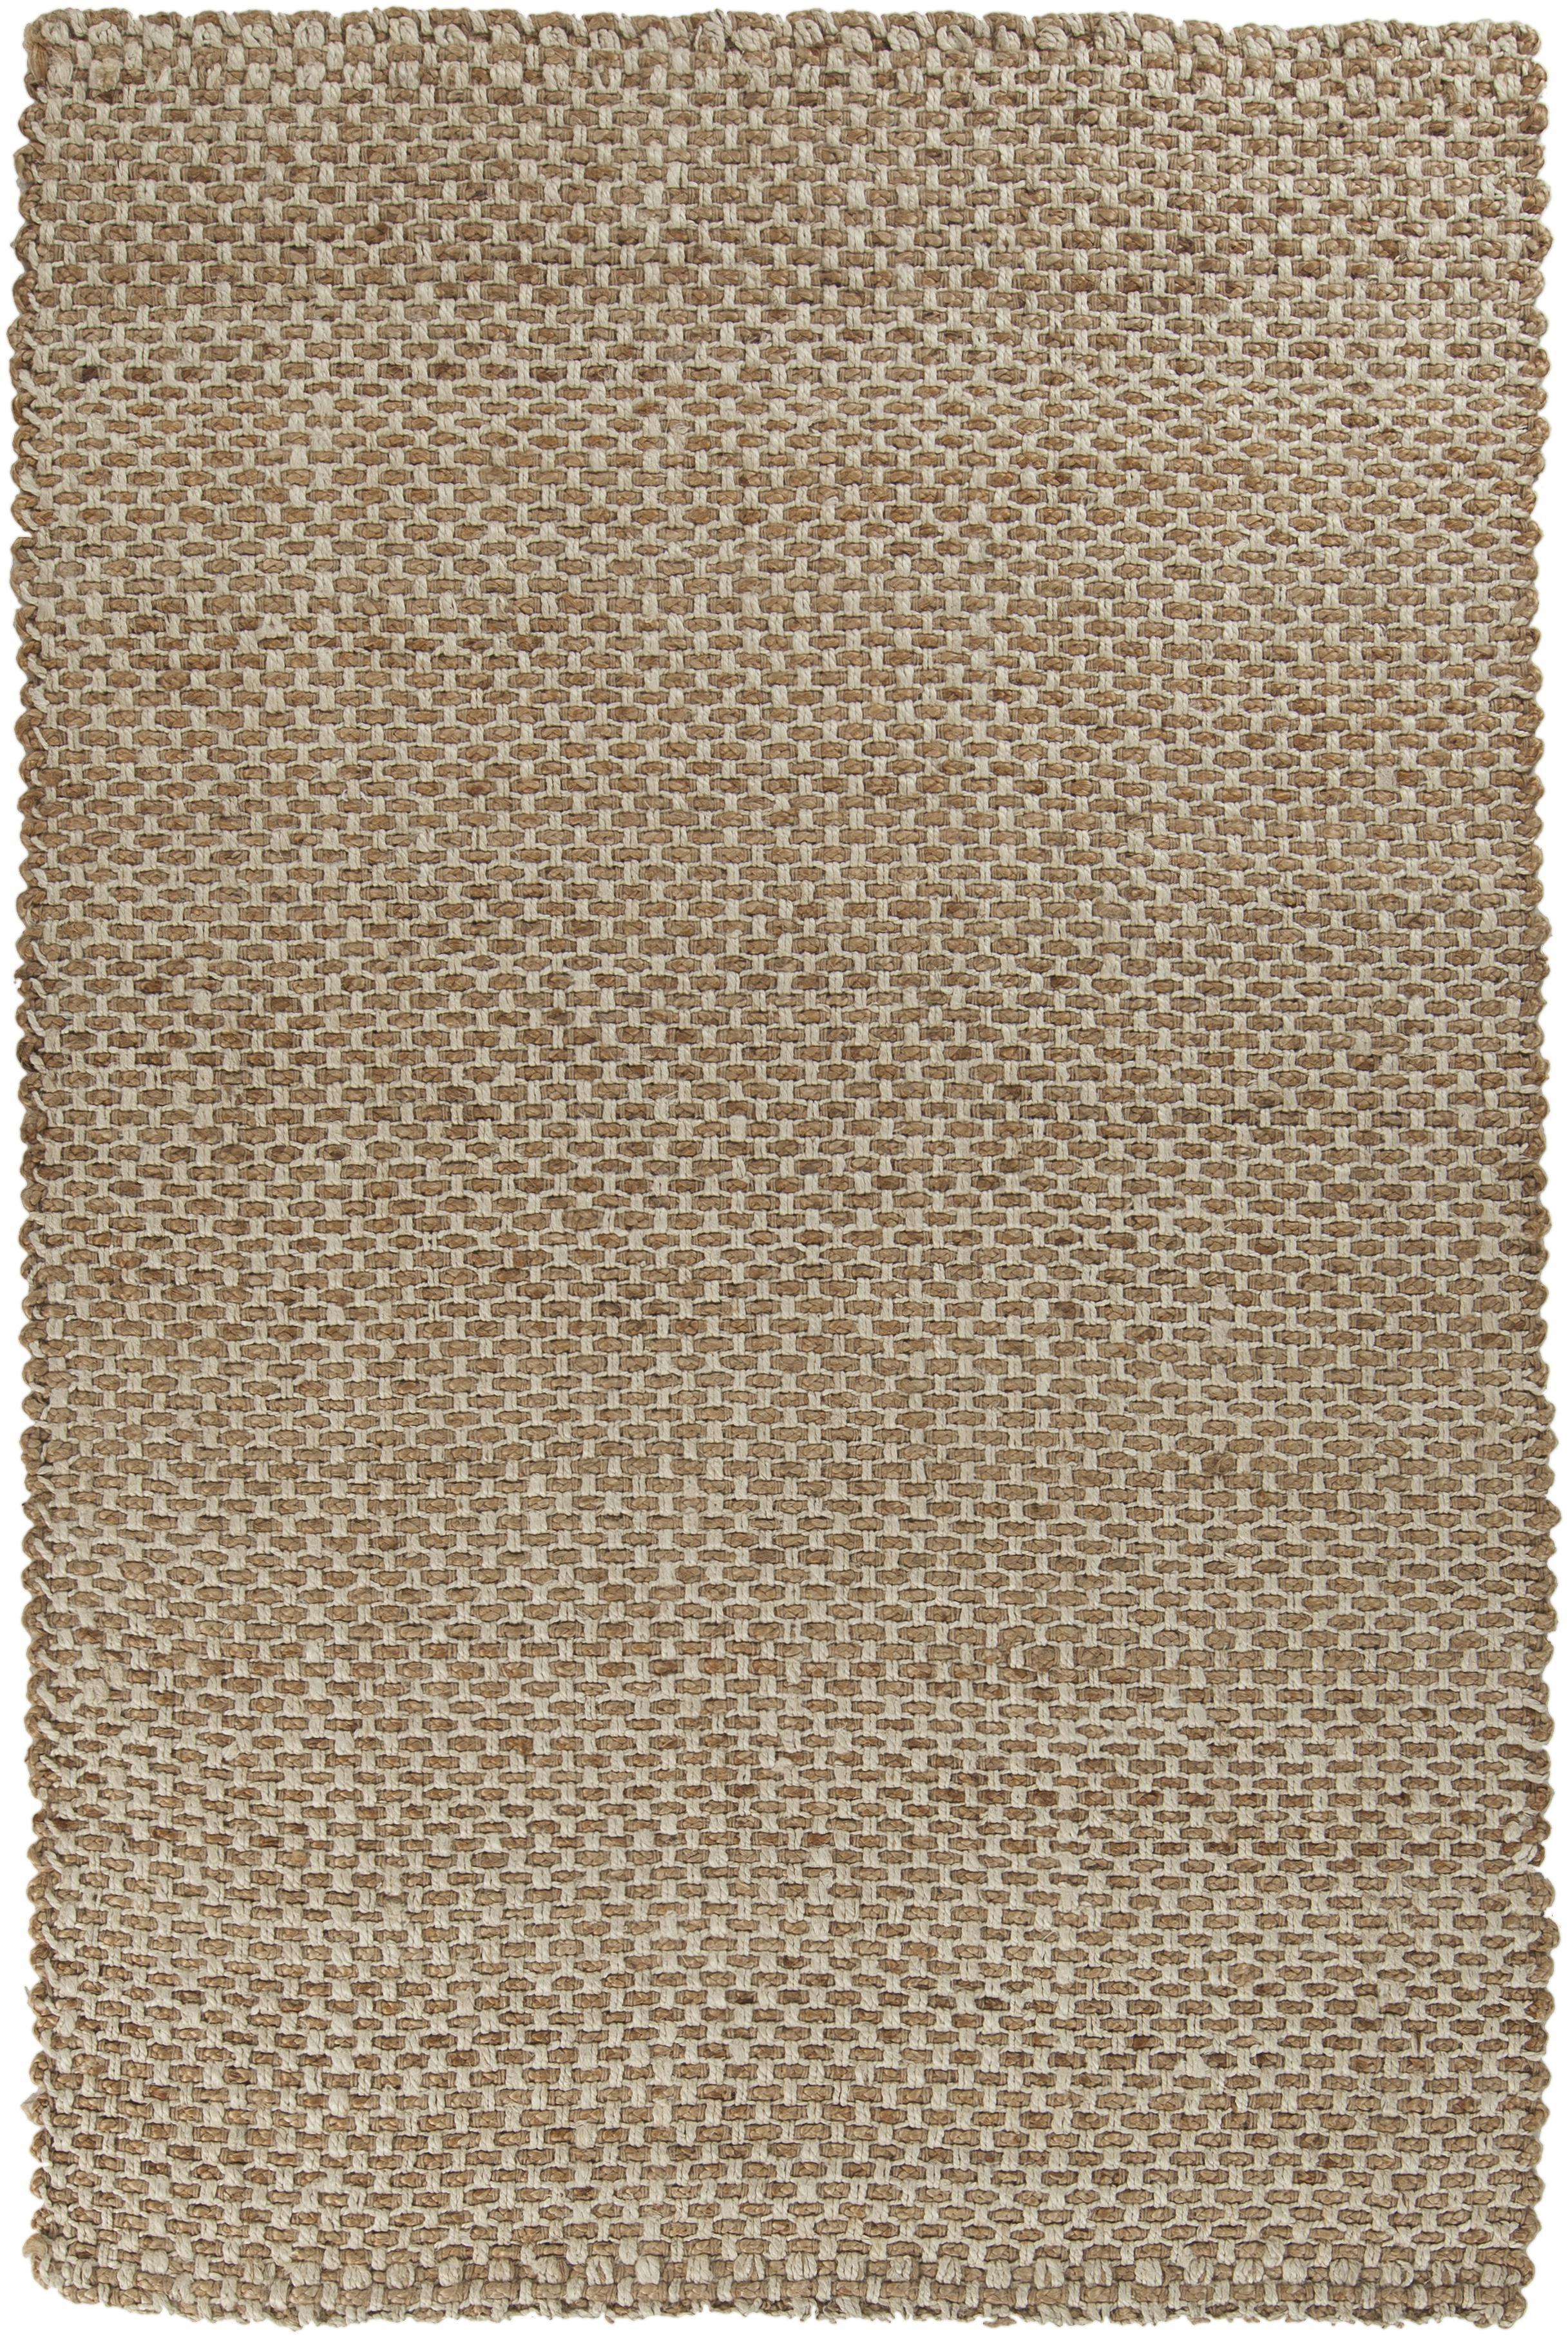 Surya Reeds 5' x 8' - Item Number: REED824-58